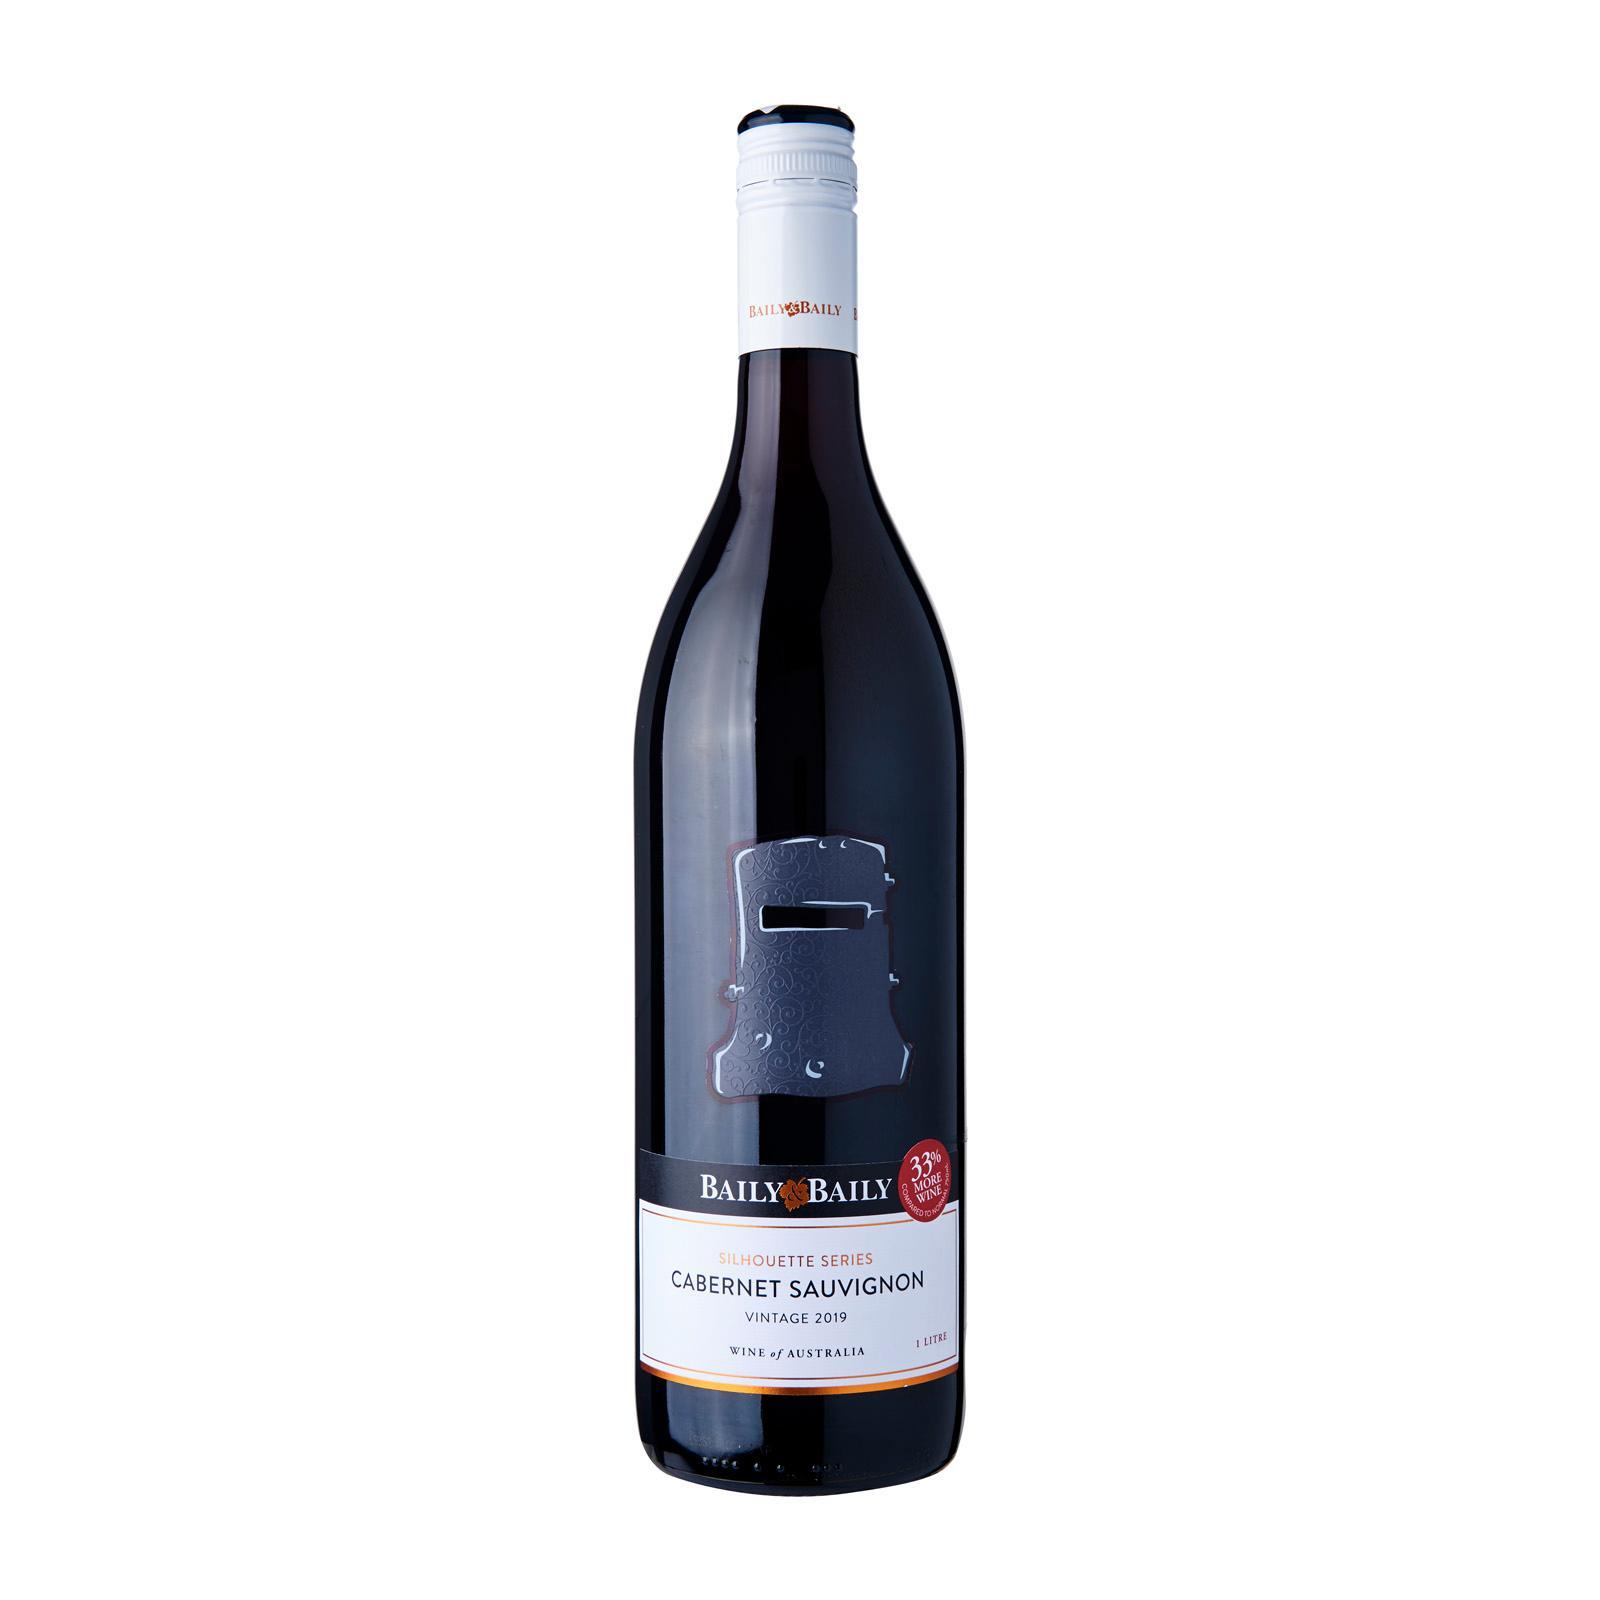 Baily and Baily Silhouette Cabernet Sauvignon Red Wine Australia